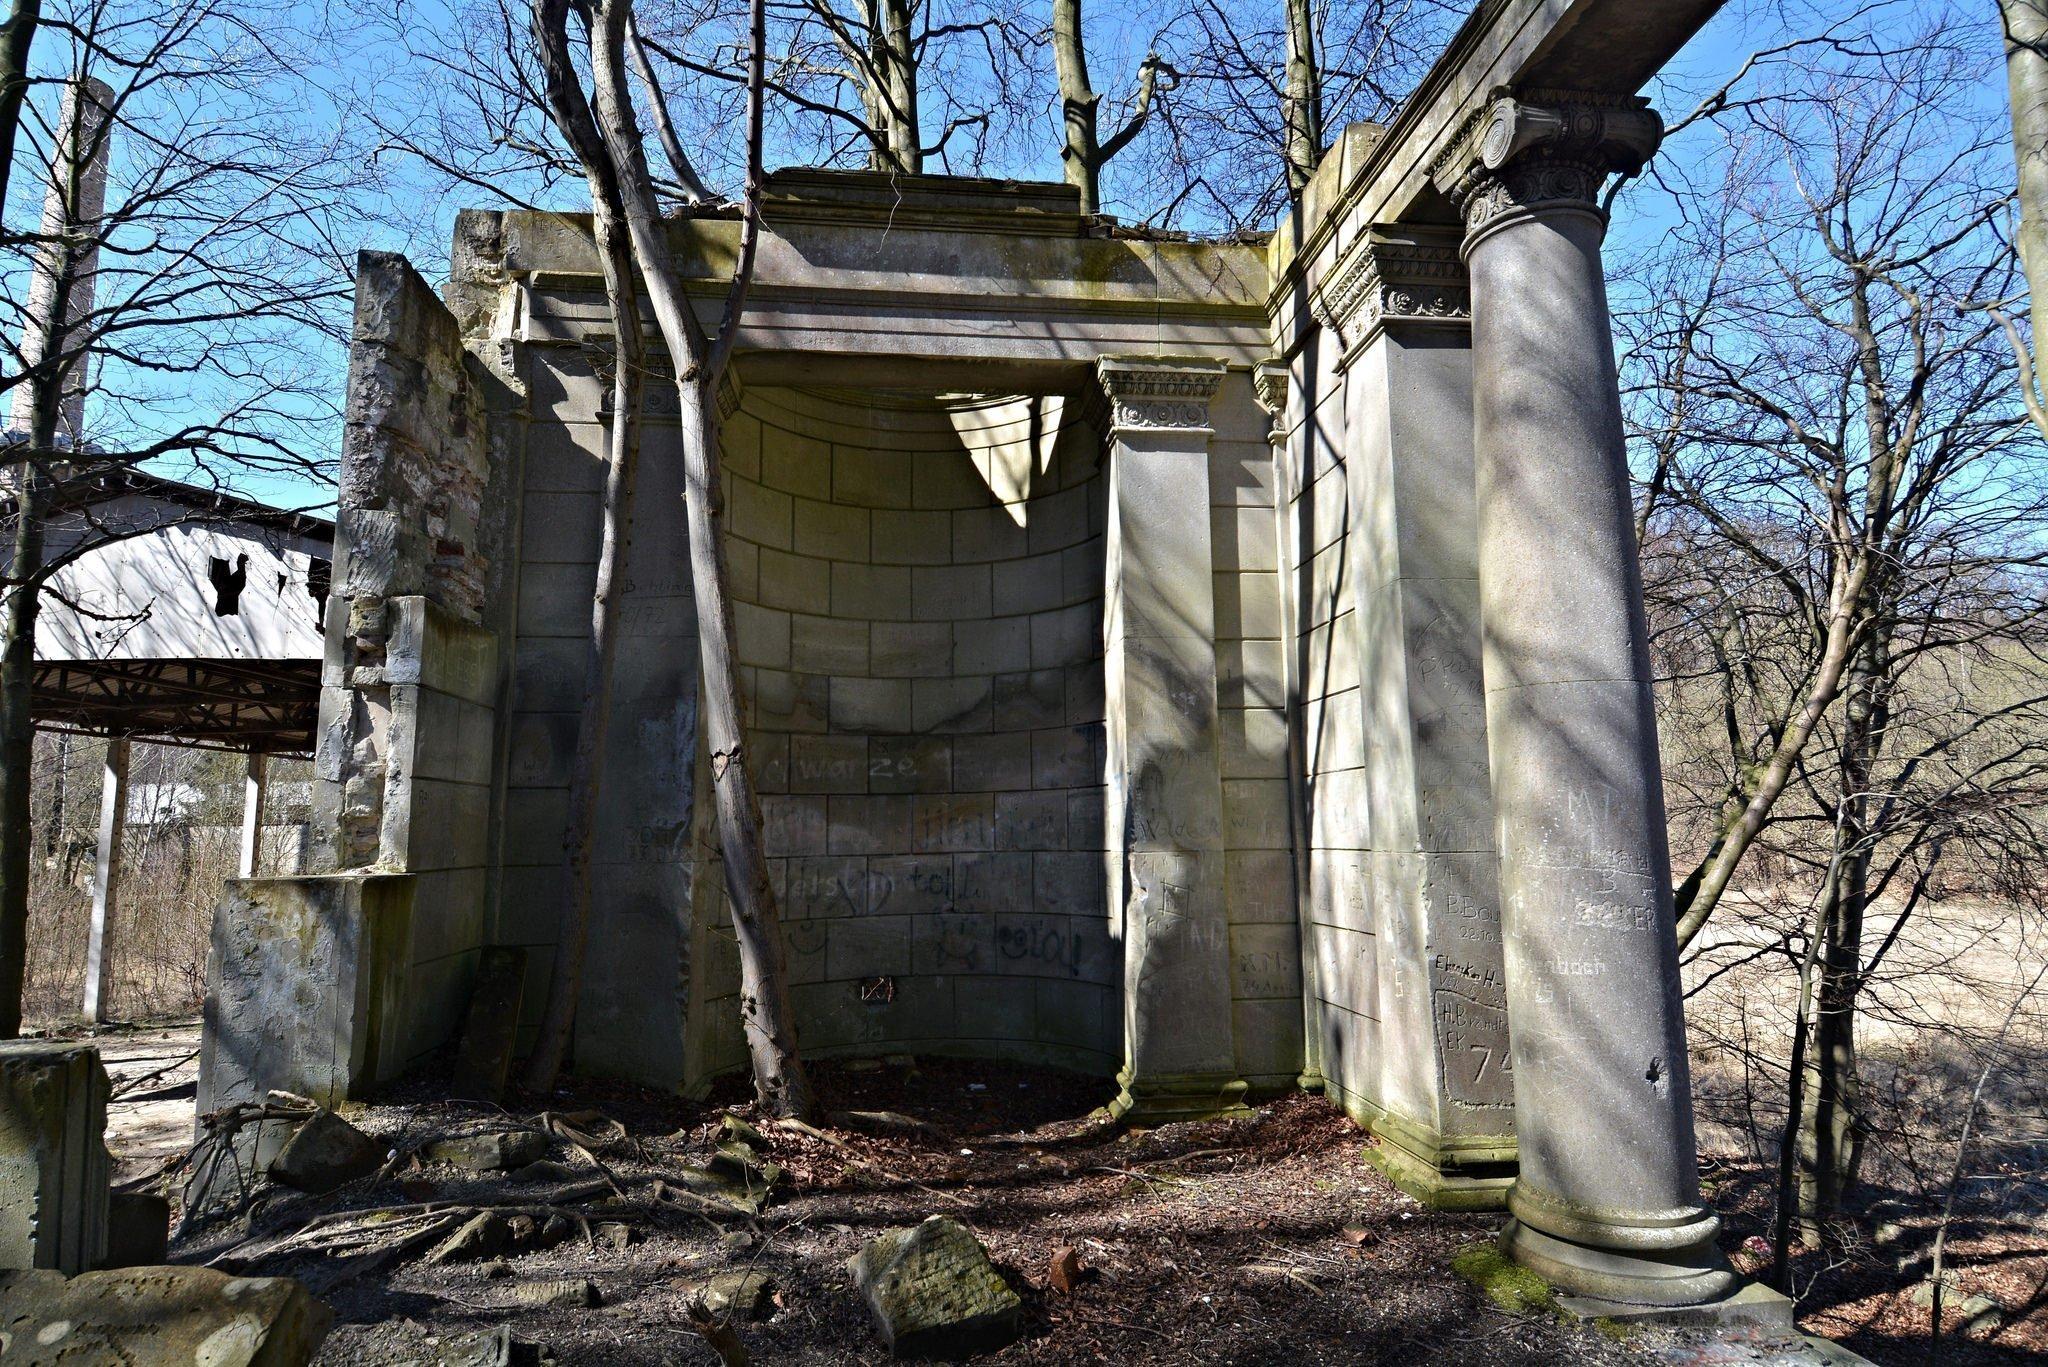 burg ruinen verlassen lost places urbex abandoned germany deutschland ddr